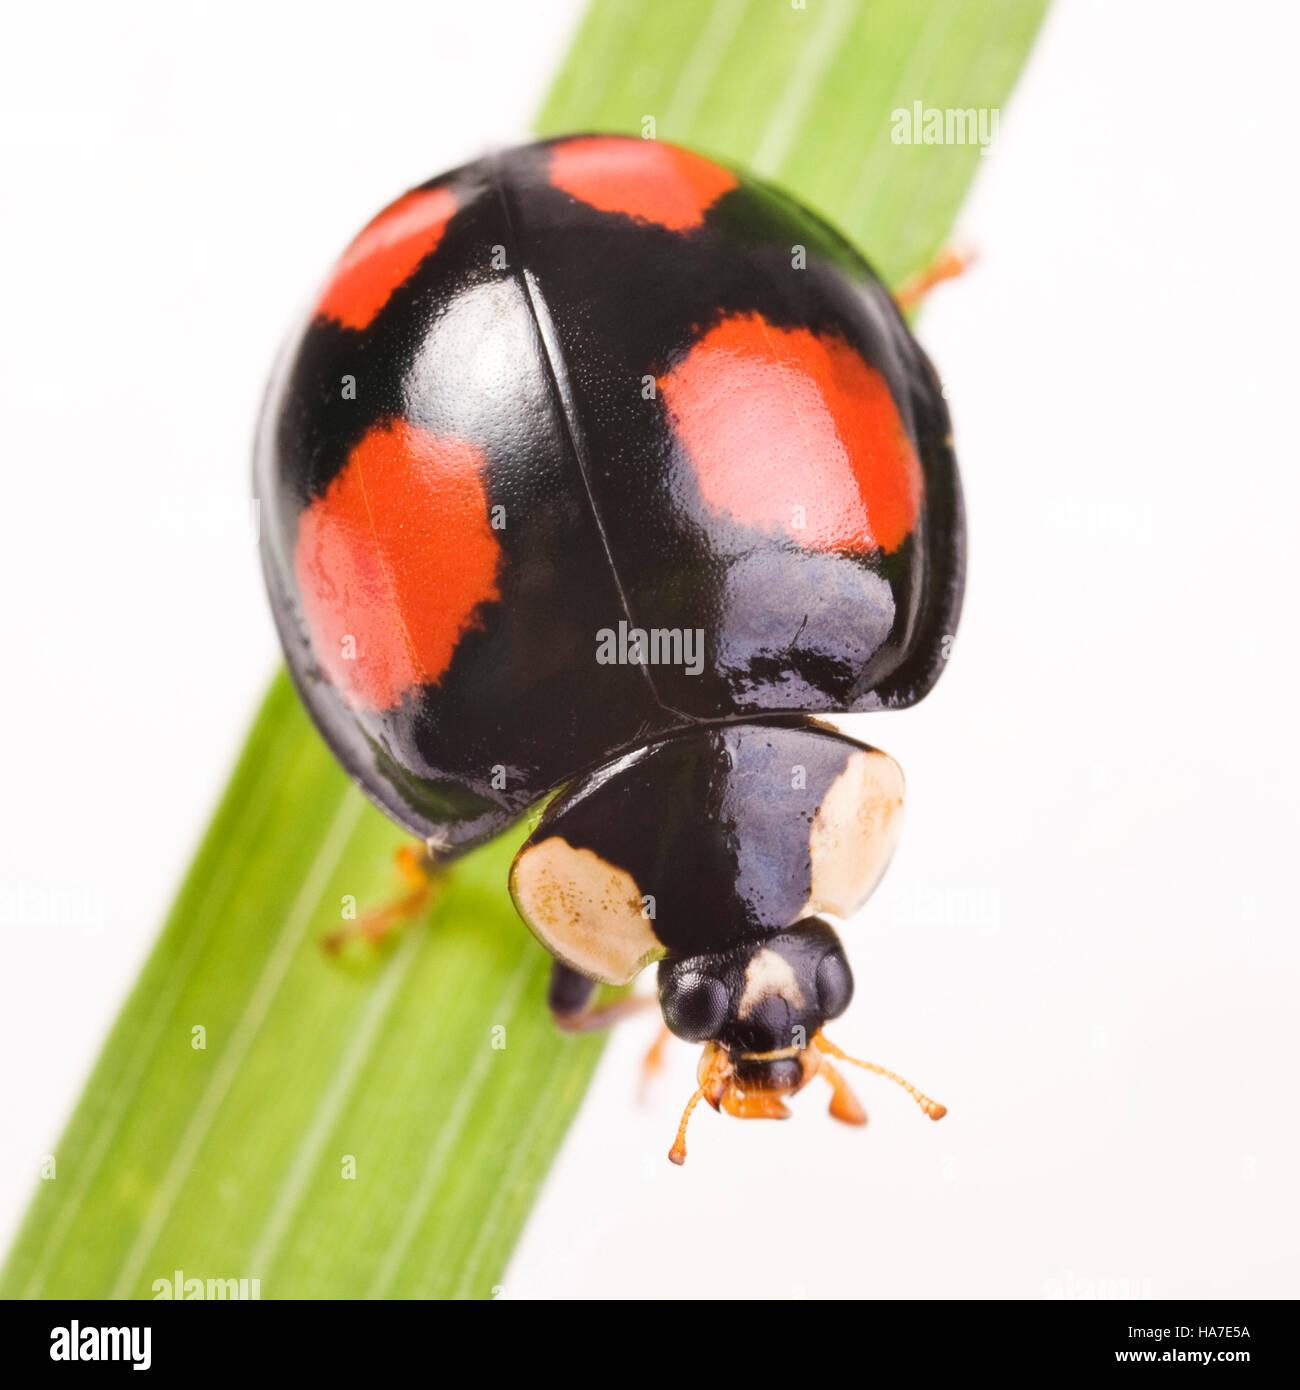 Two-spotted Lady Beetle (Adalia bipunctata), black species - Stock Image